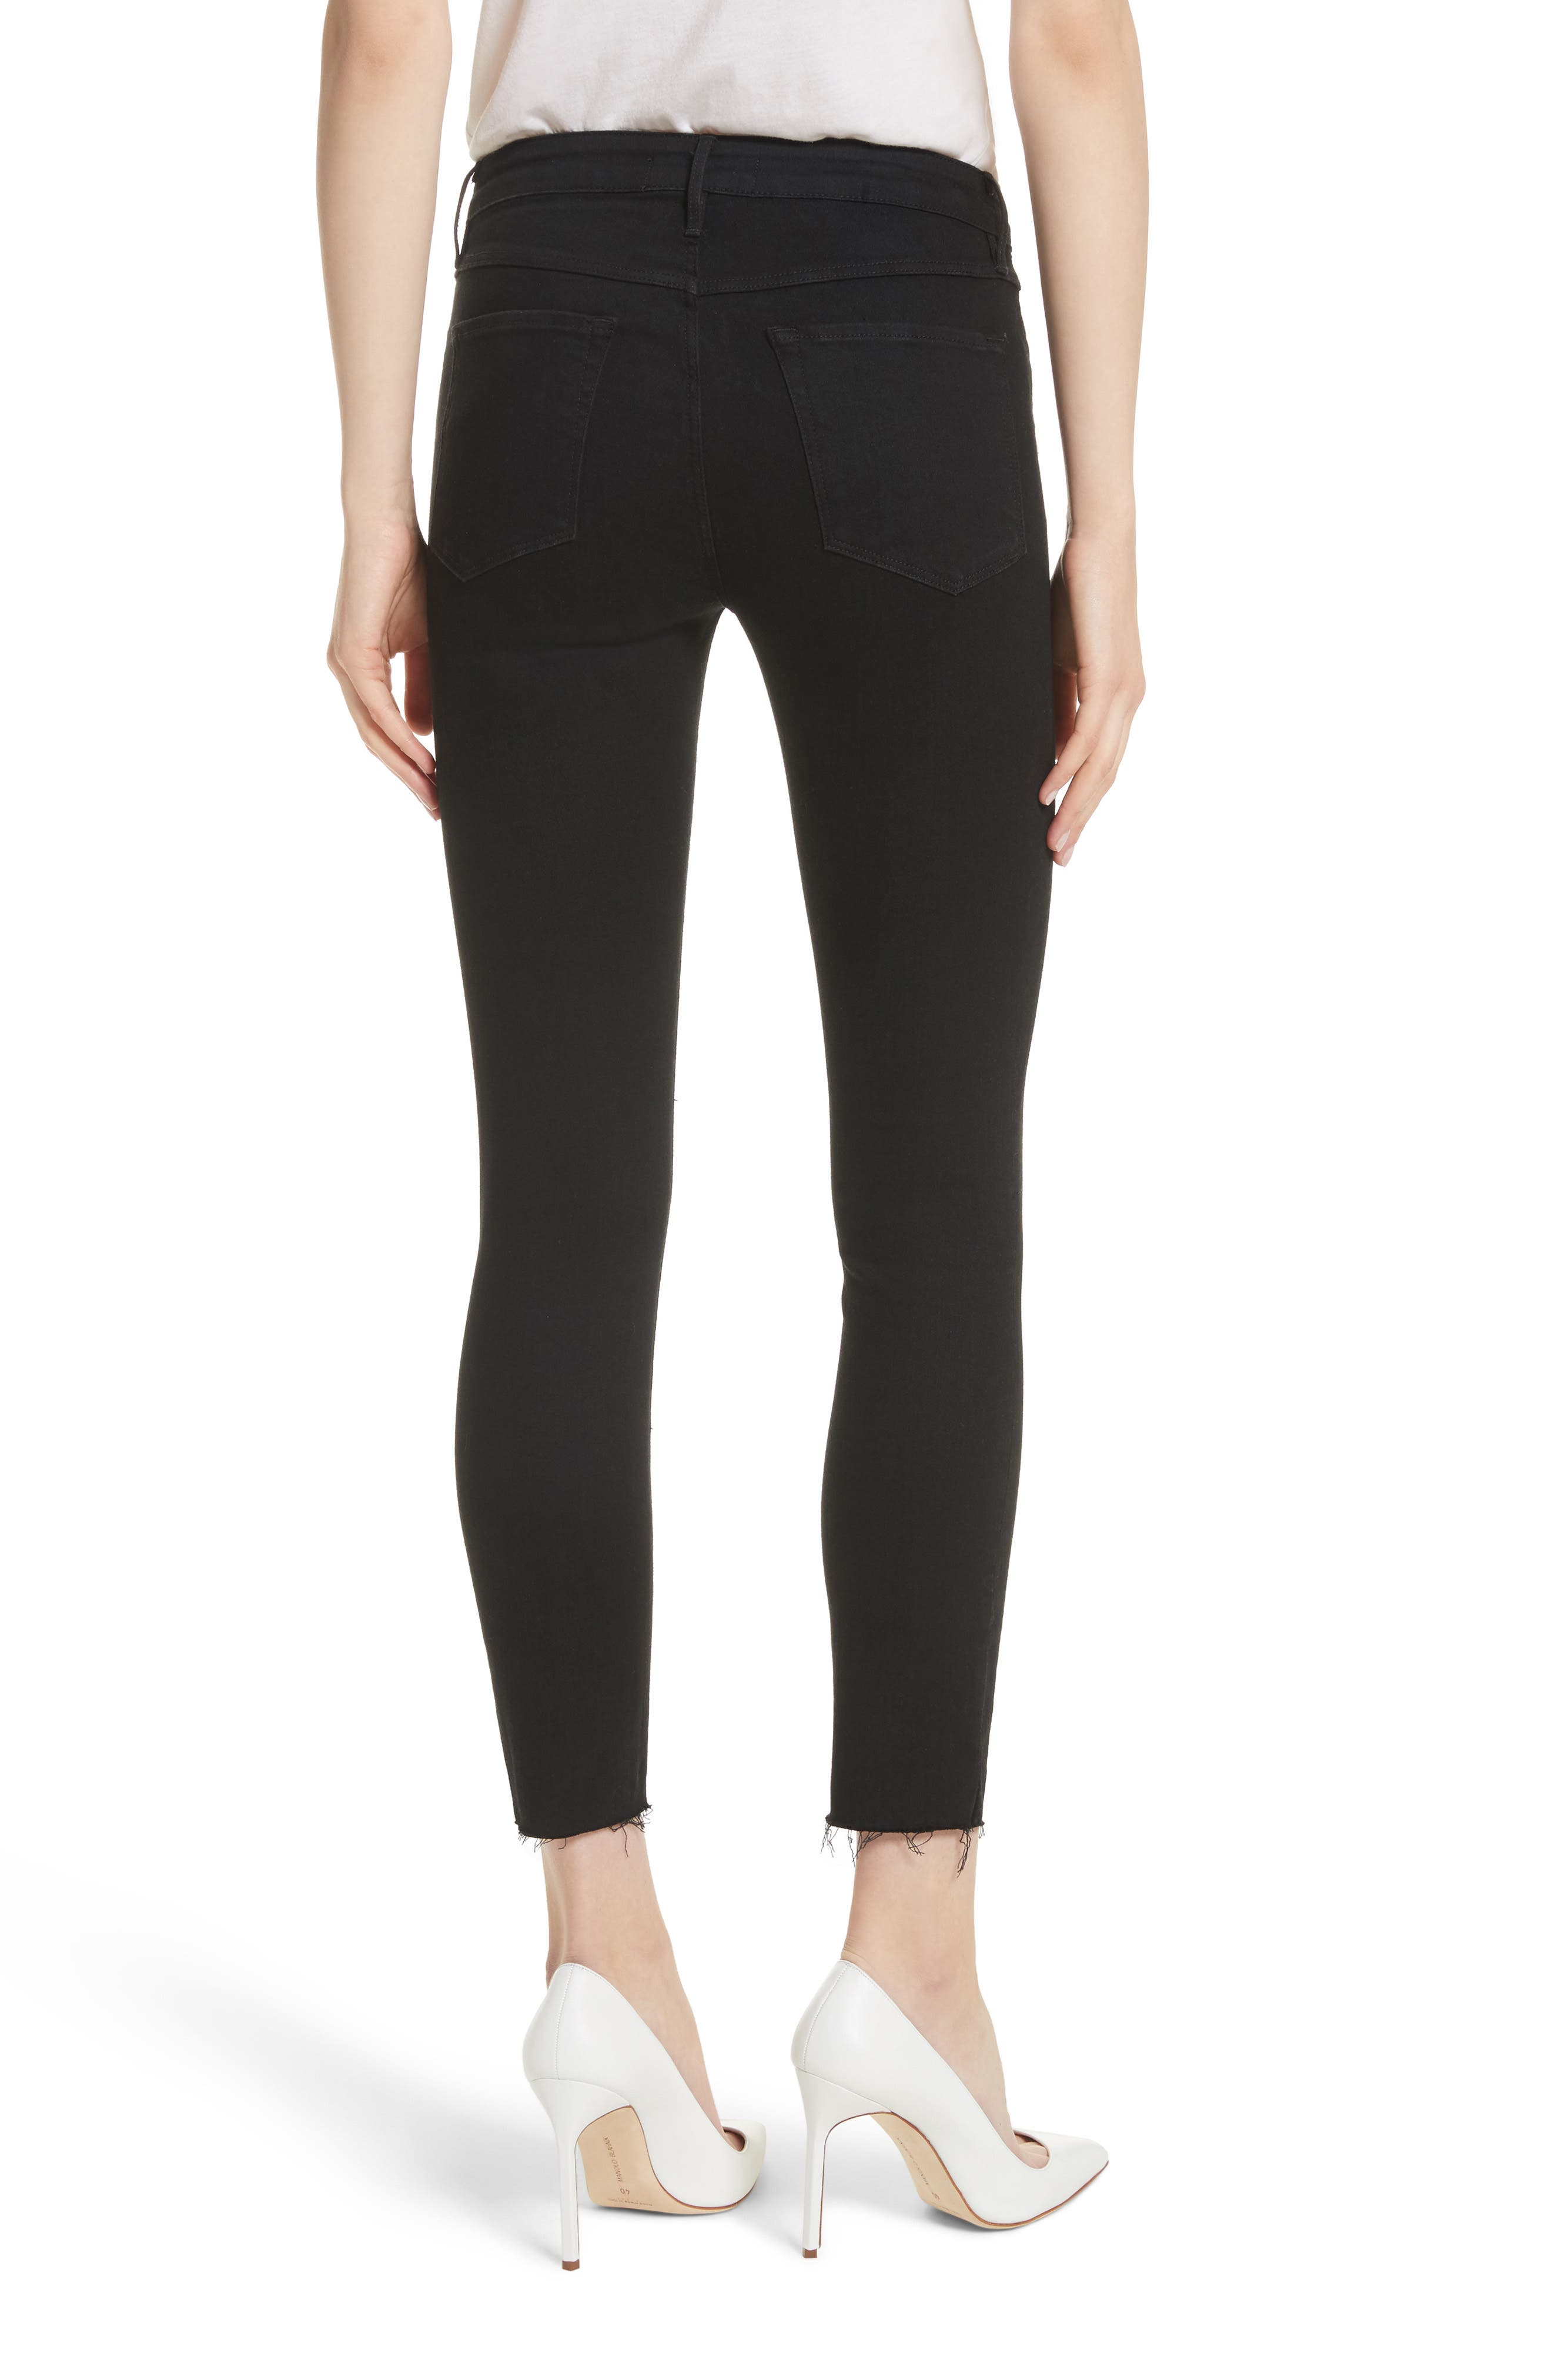 W2 Crop Skinny Jeans,                             Alternate thumbnail 2, color,                             Black Tear